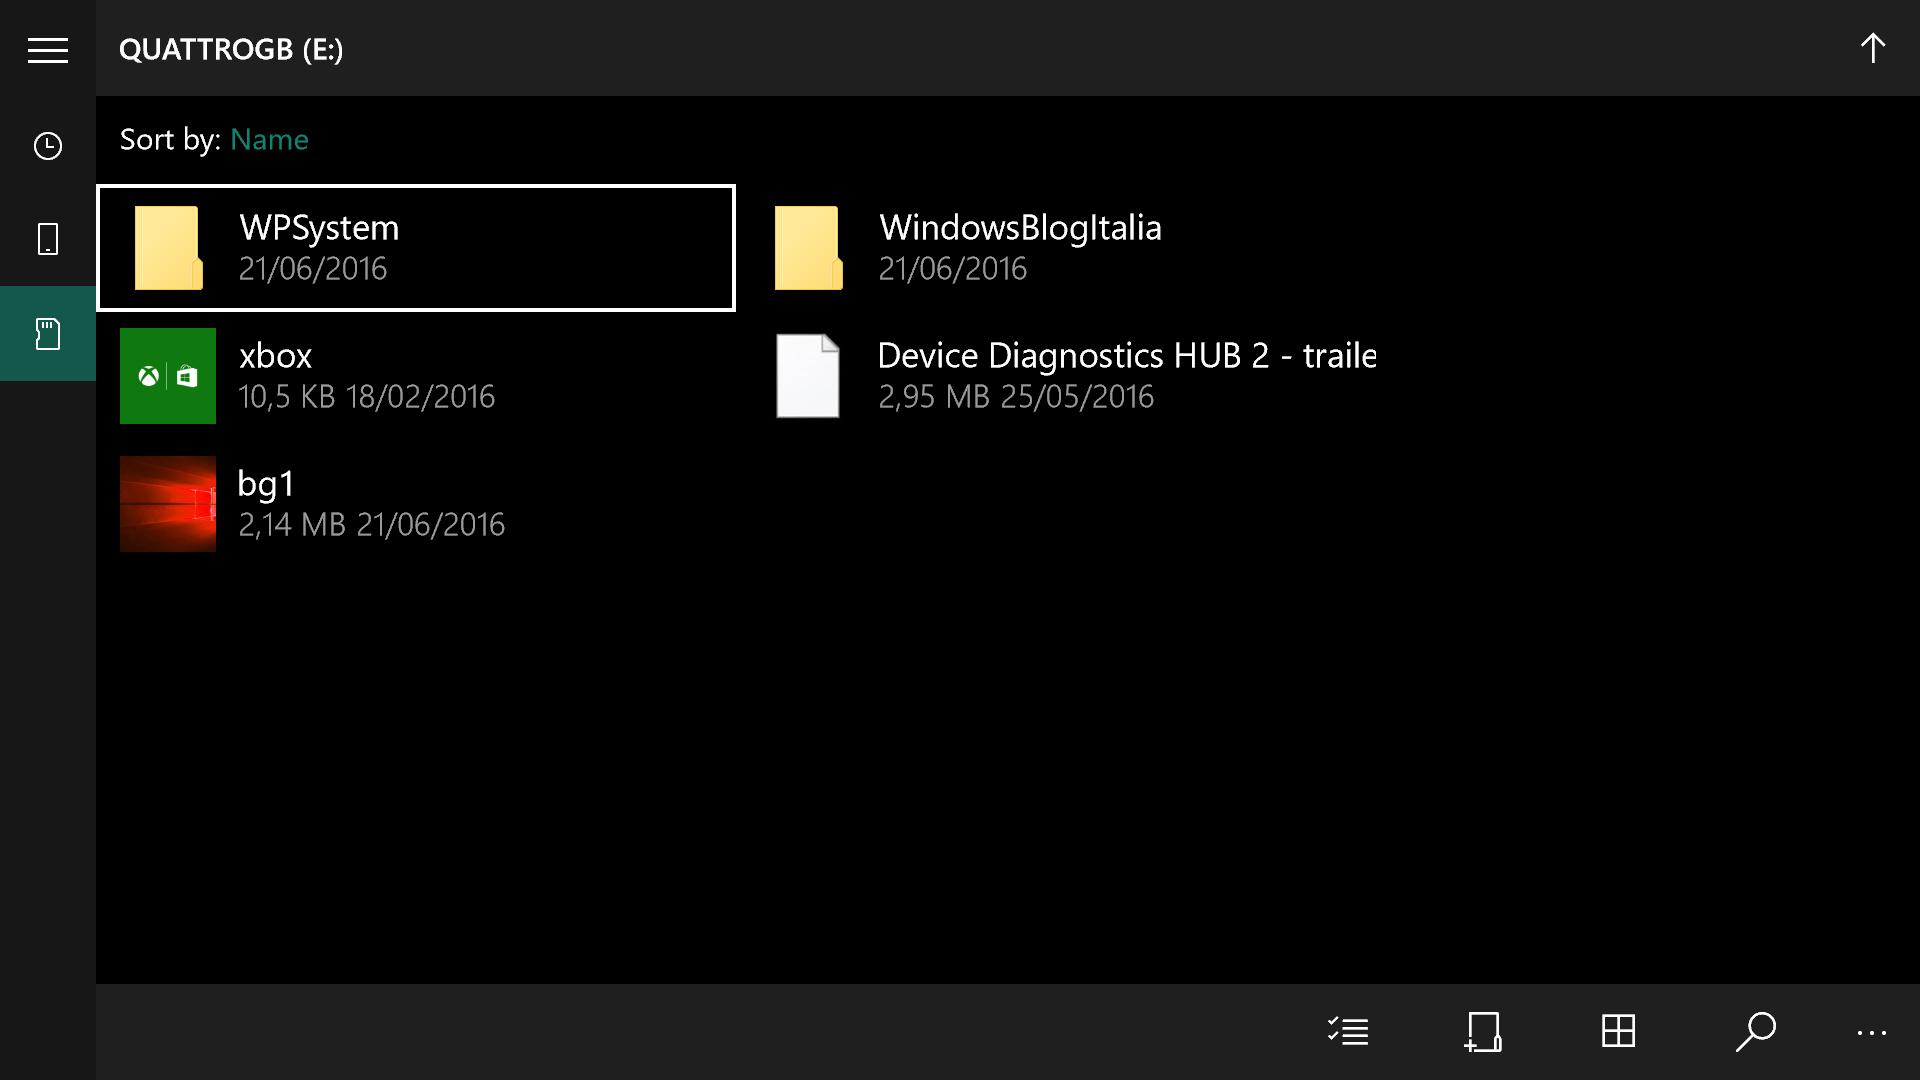 Screenshot_2016-06-21_18-41-45